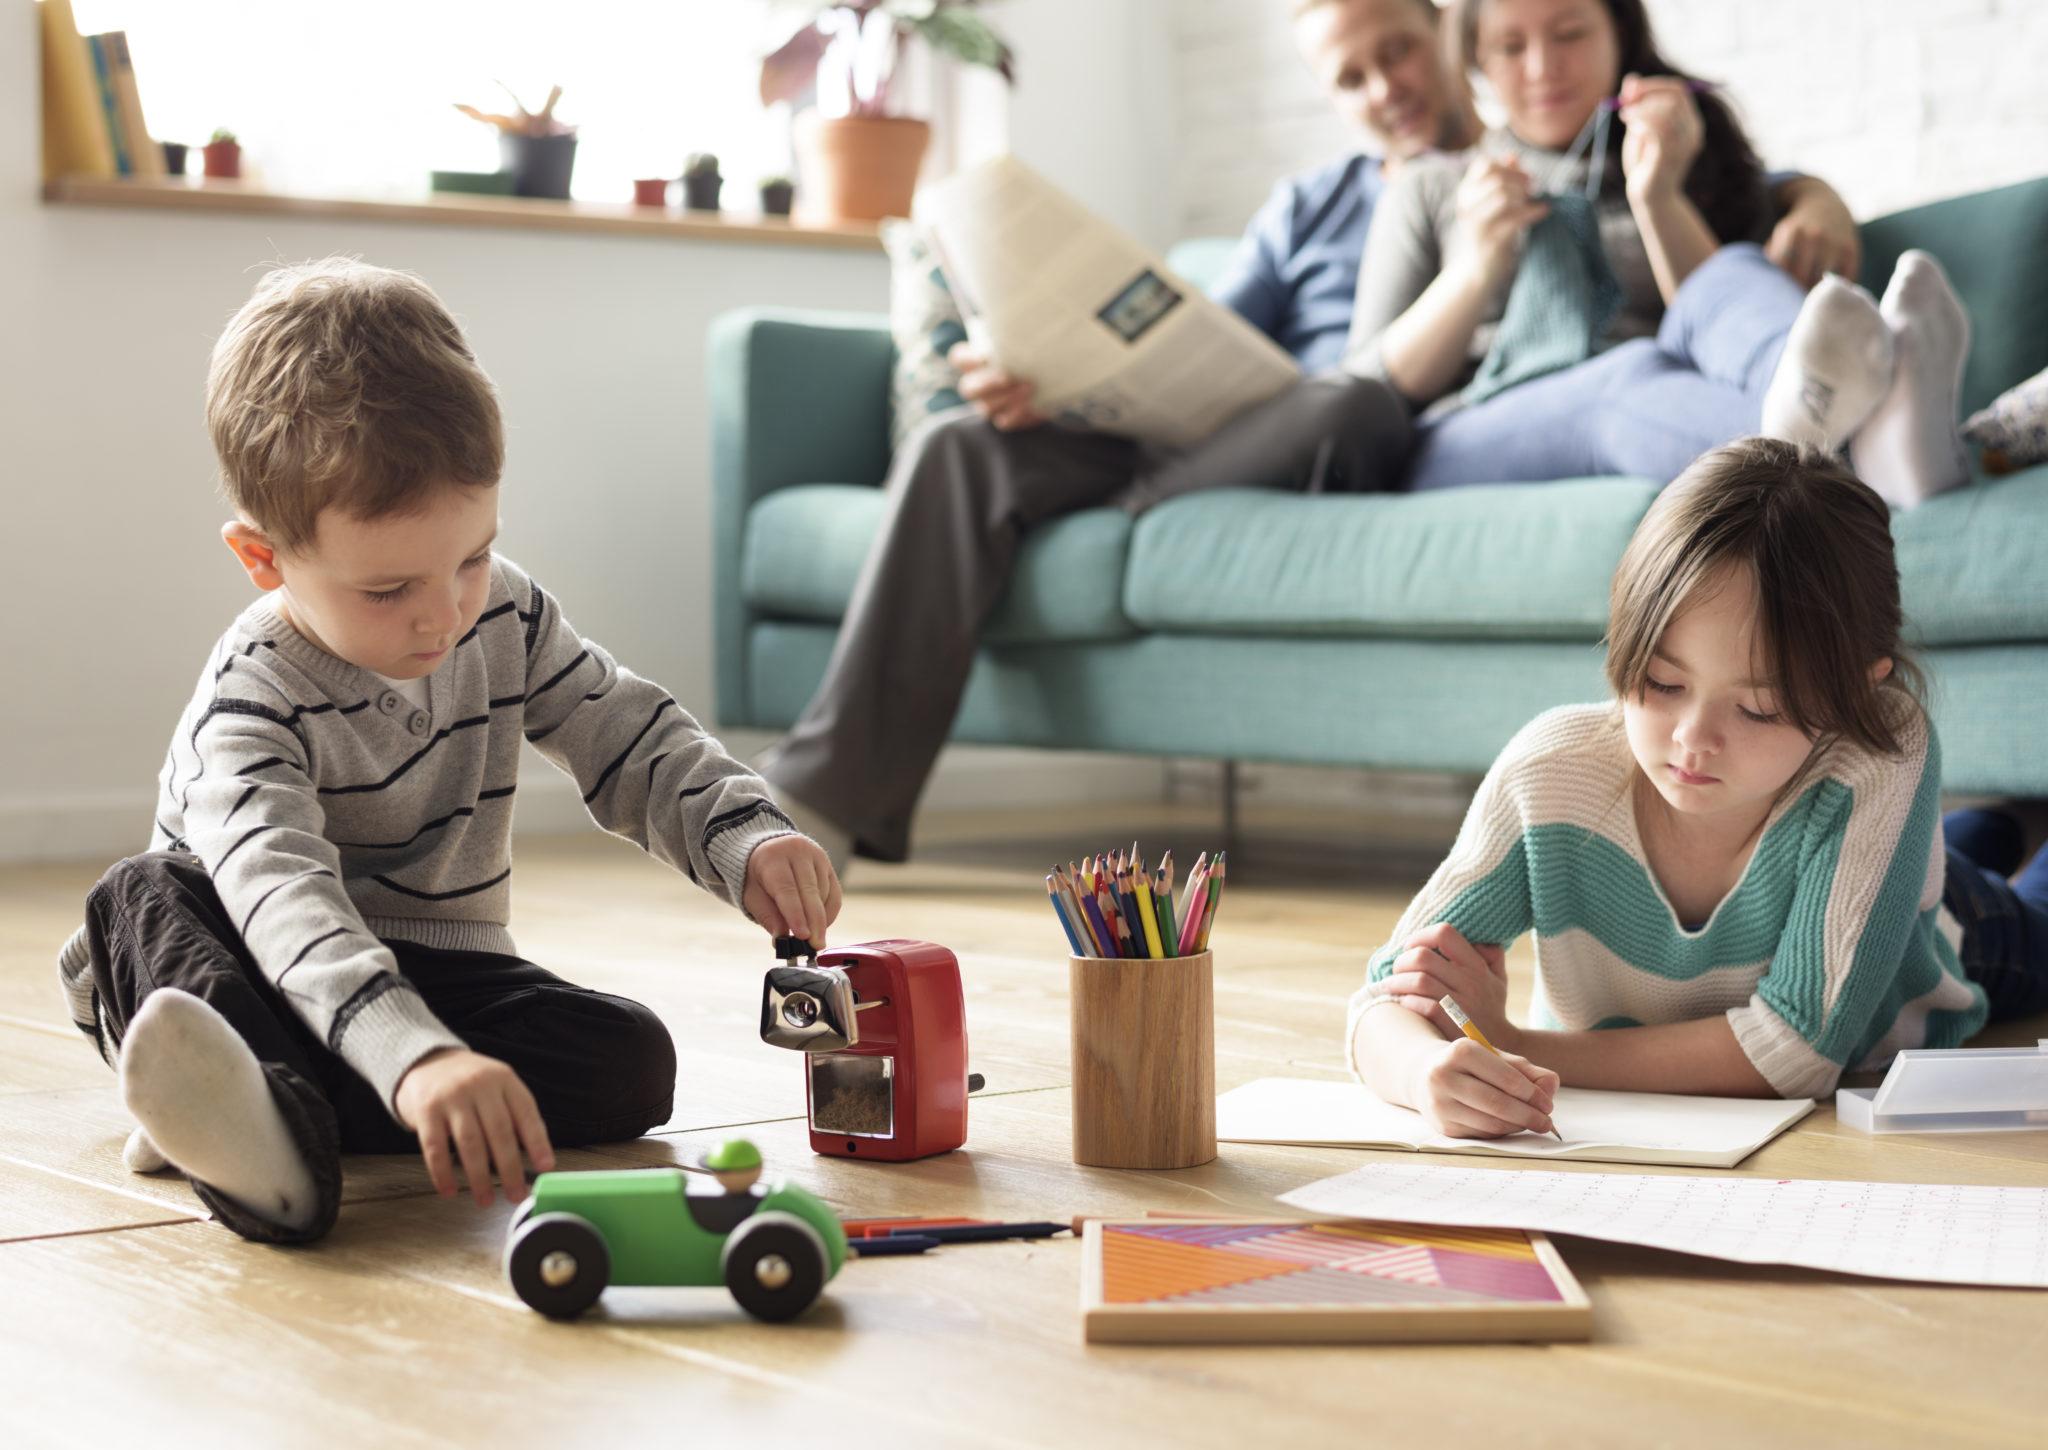 Hear from Bill Hayward: Make Healthy Home Choices – Boston Globe